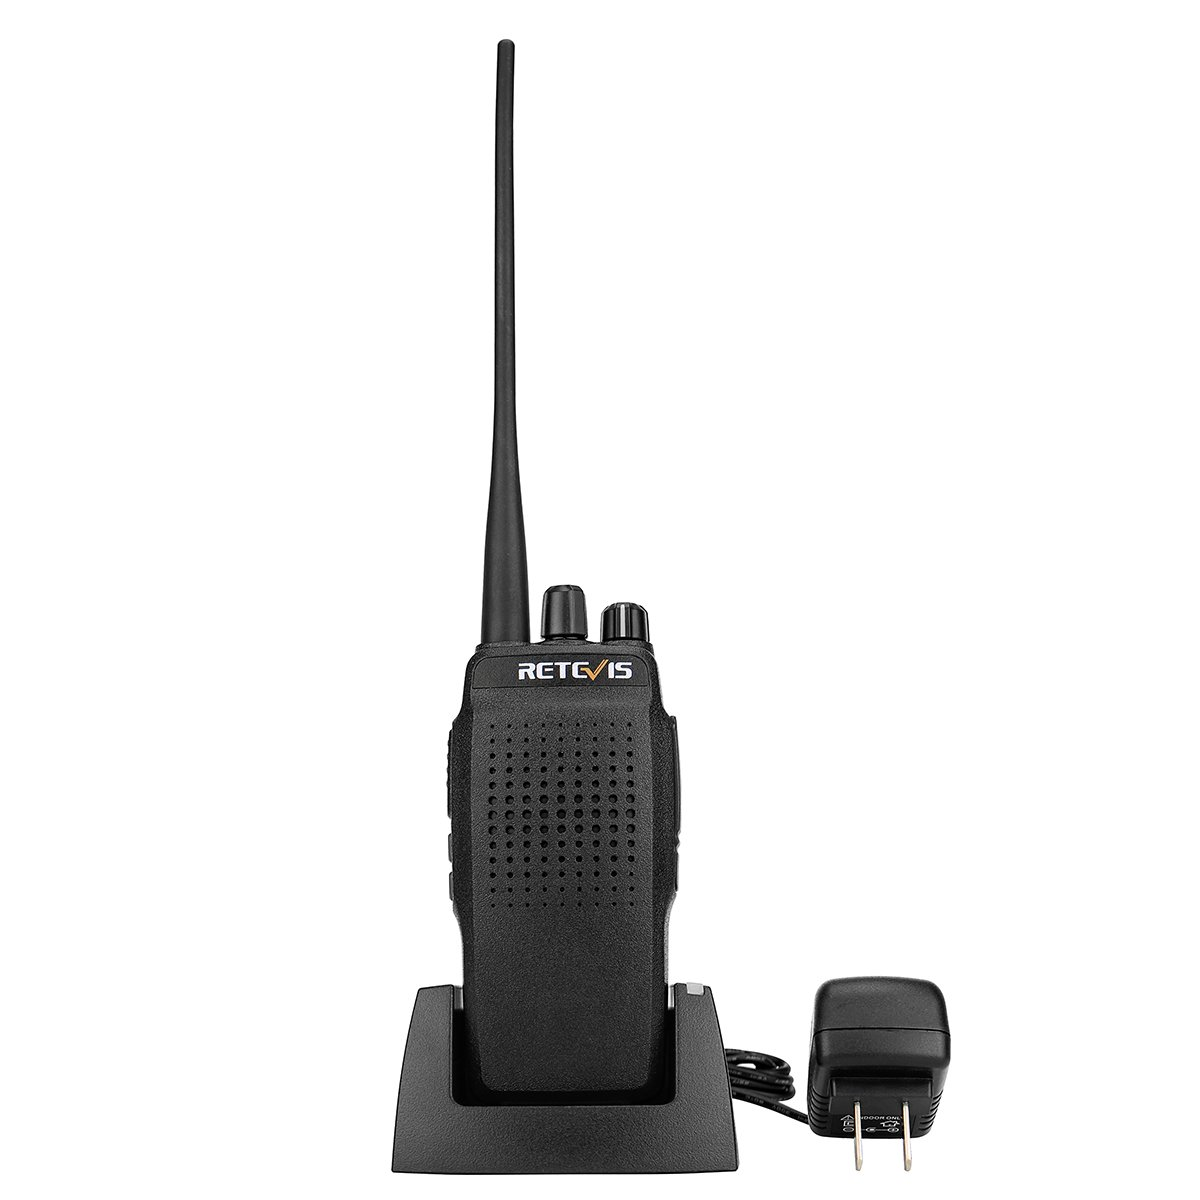 Retevis RT26 Two Way Radio High Power Long Range UHF 3000mAh High Power VOX Scan FM Walkie Talkies(1 Pack)